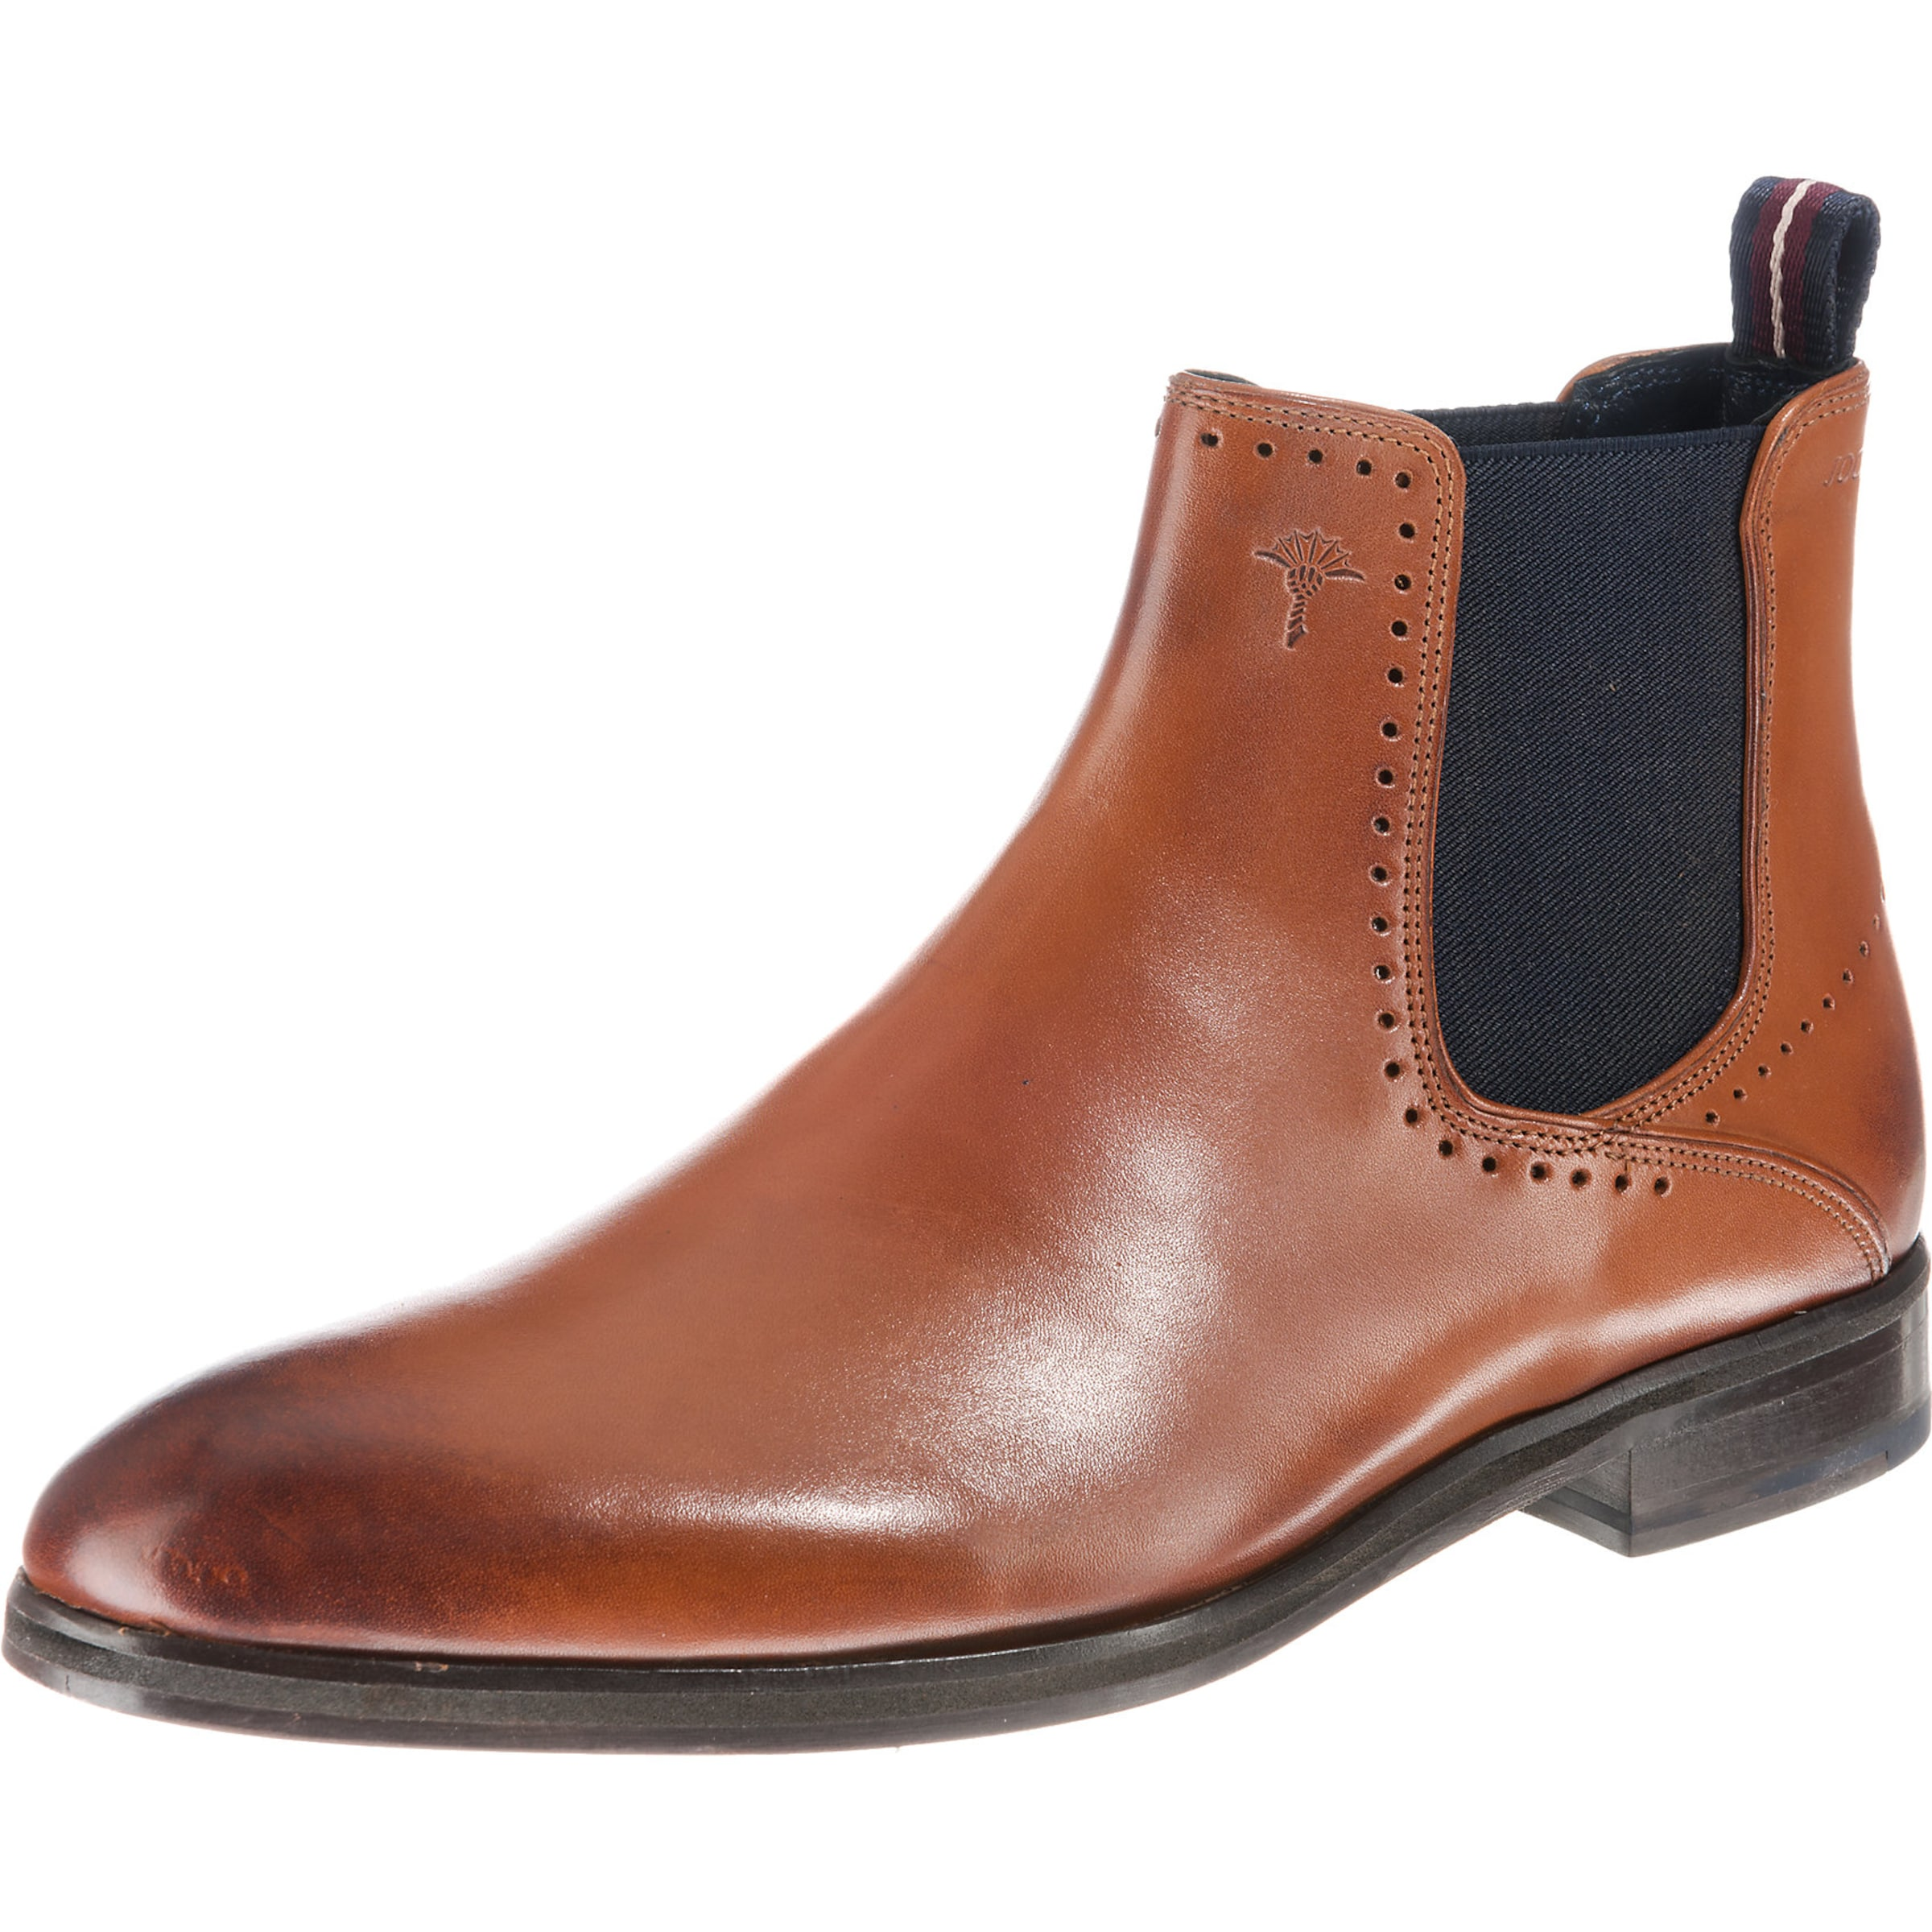 Boots In CognacSchwarz Boots In Boots Boots In JoopChelsea CognacSchwarz JoopChelsea JoopChelsea JoopChelsea CognacSchwarz iOuPZkXT